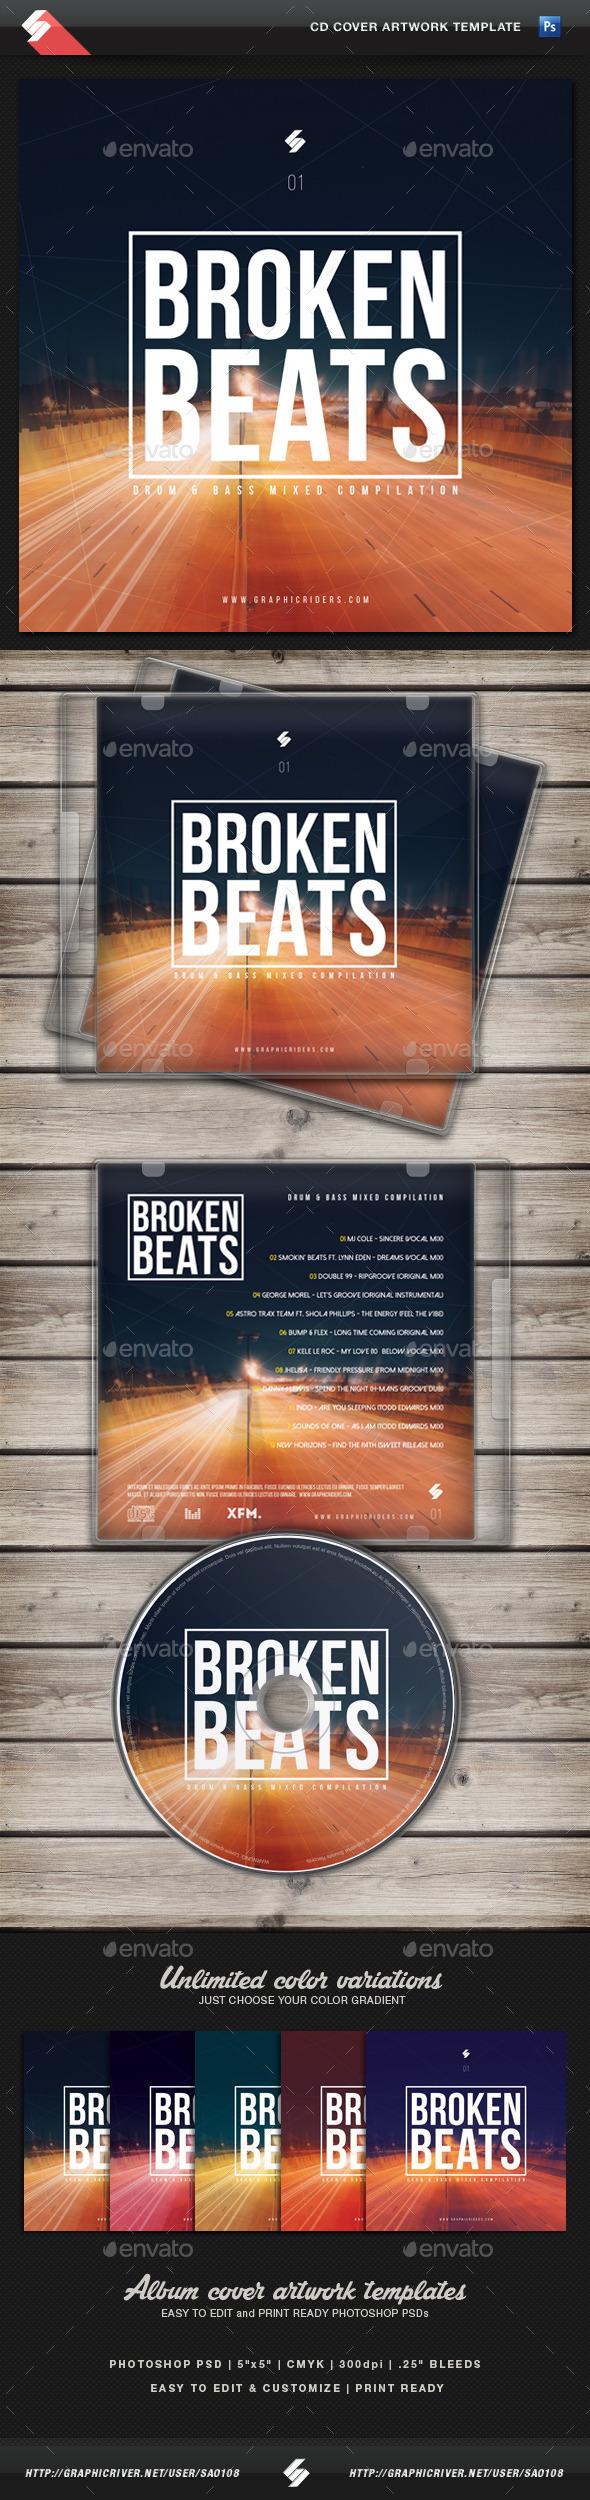 Broken Beats - CD Cover Artwork Template - CD & DVD Artwork Print Templates